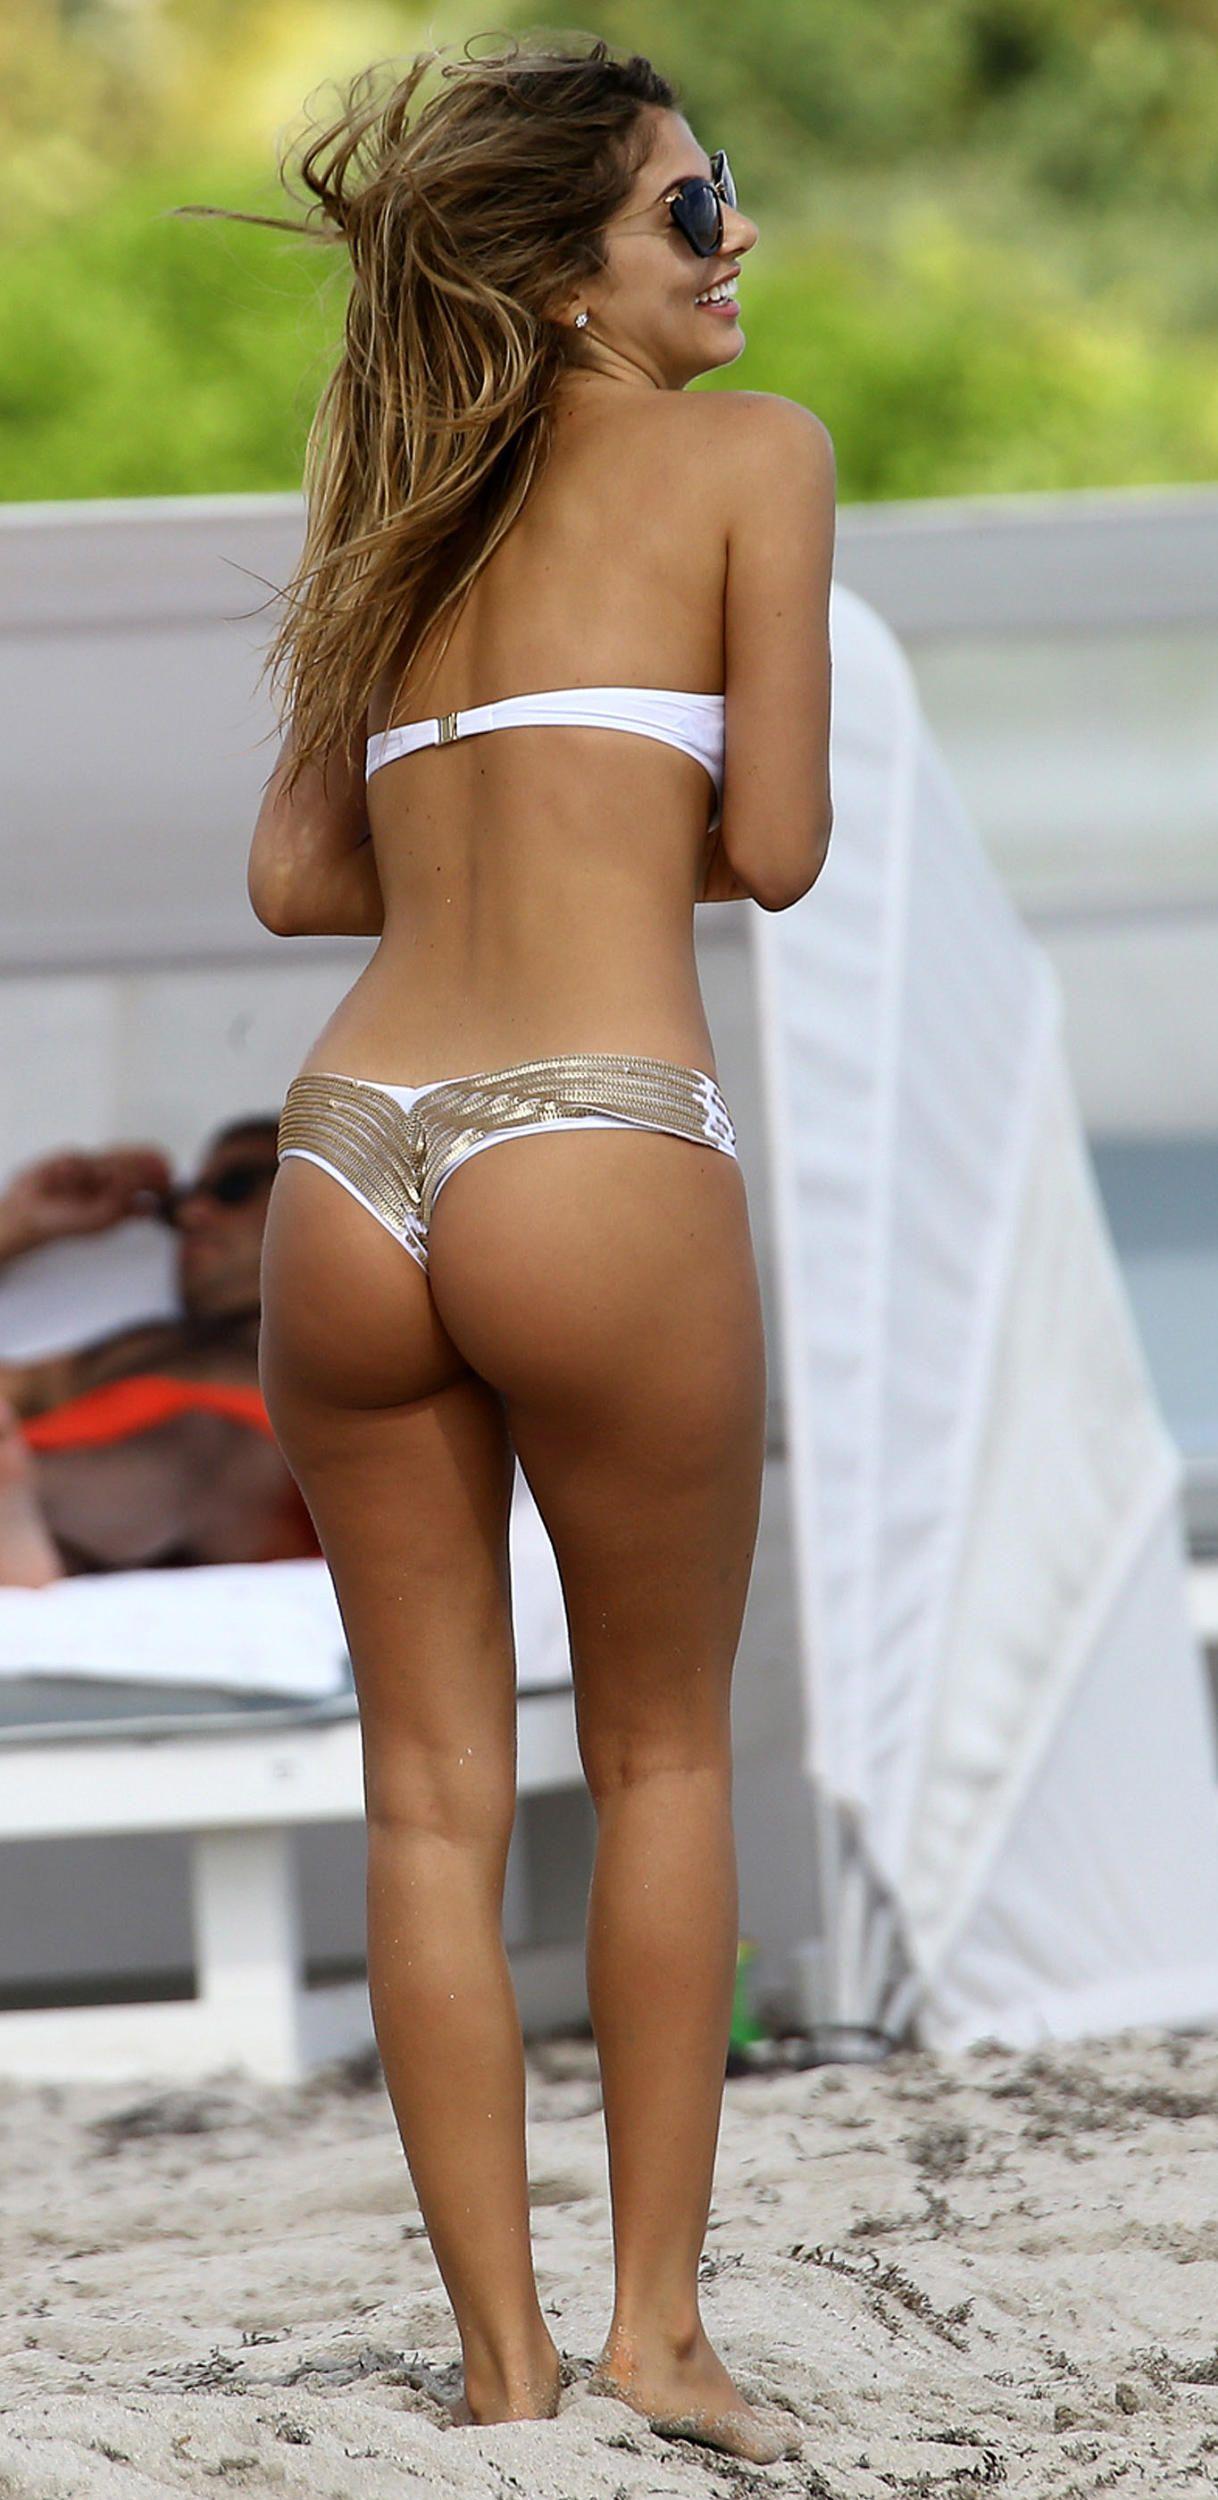 Bikini Pics Of Melissa Ca...